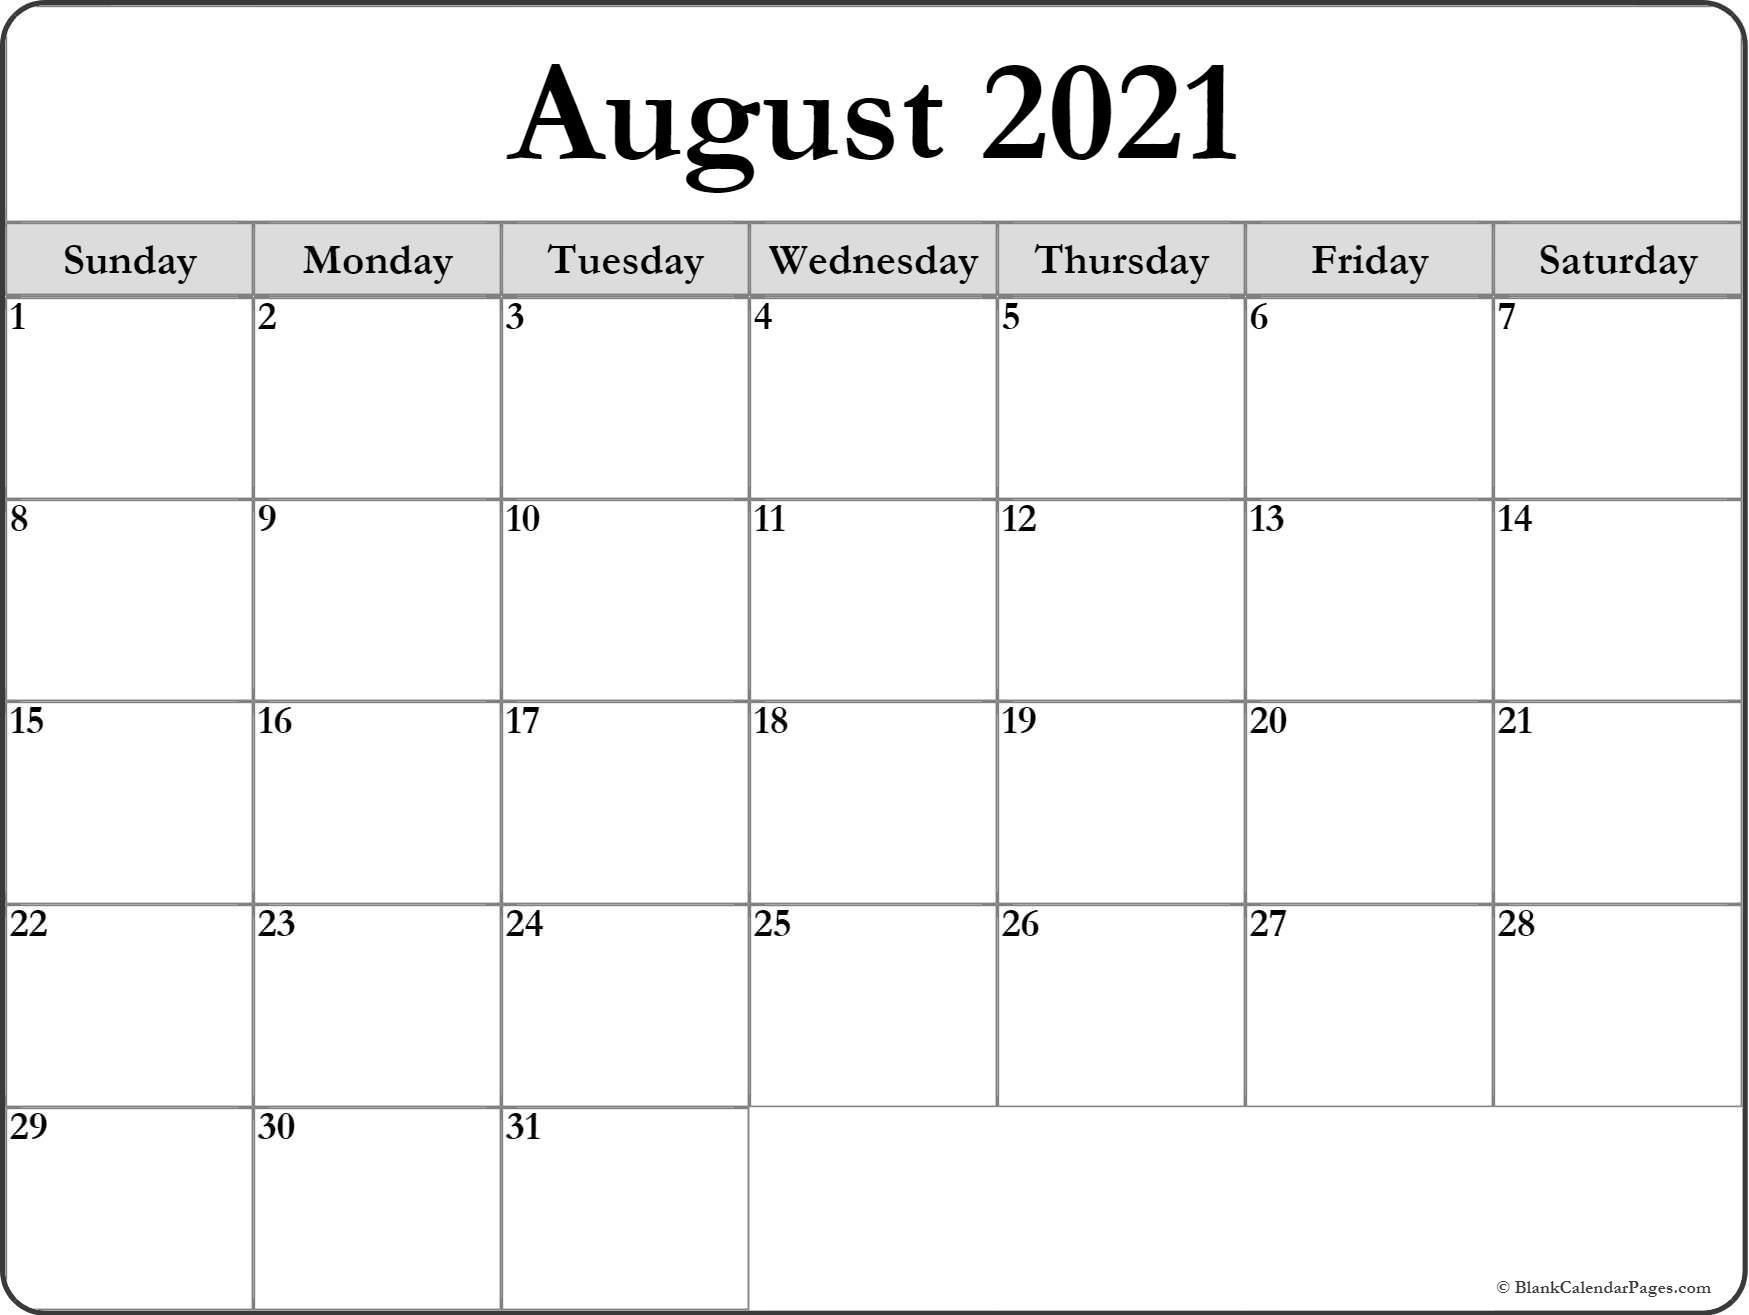 August 2021 Blank Calendar Templates